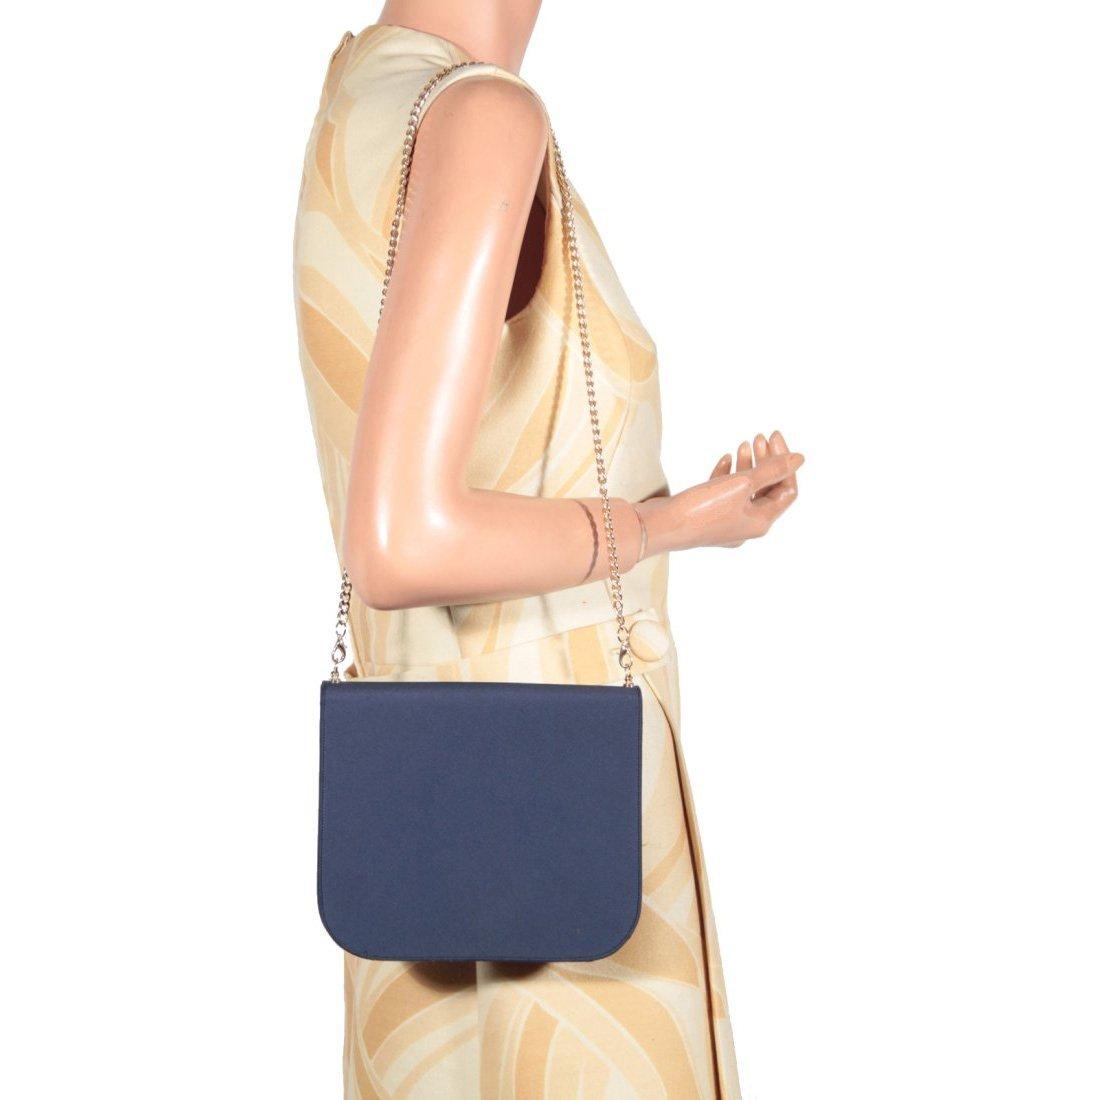 Renaud Pellegrino Blue Satin Evening Shoulder Bag